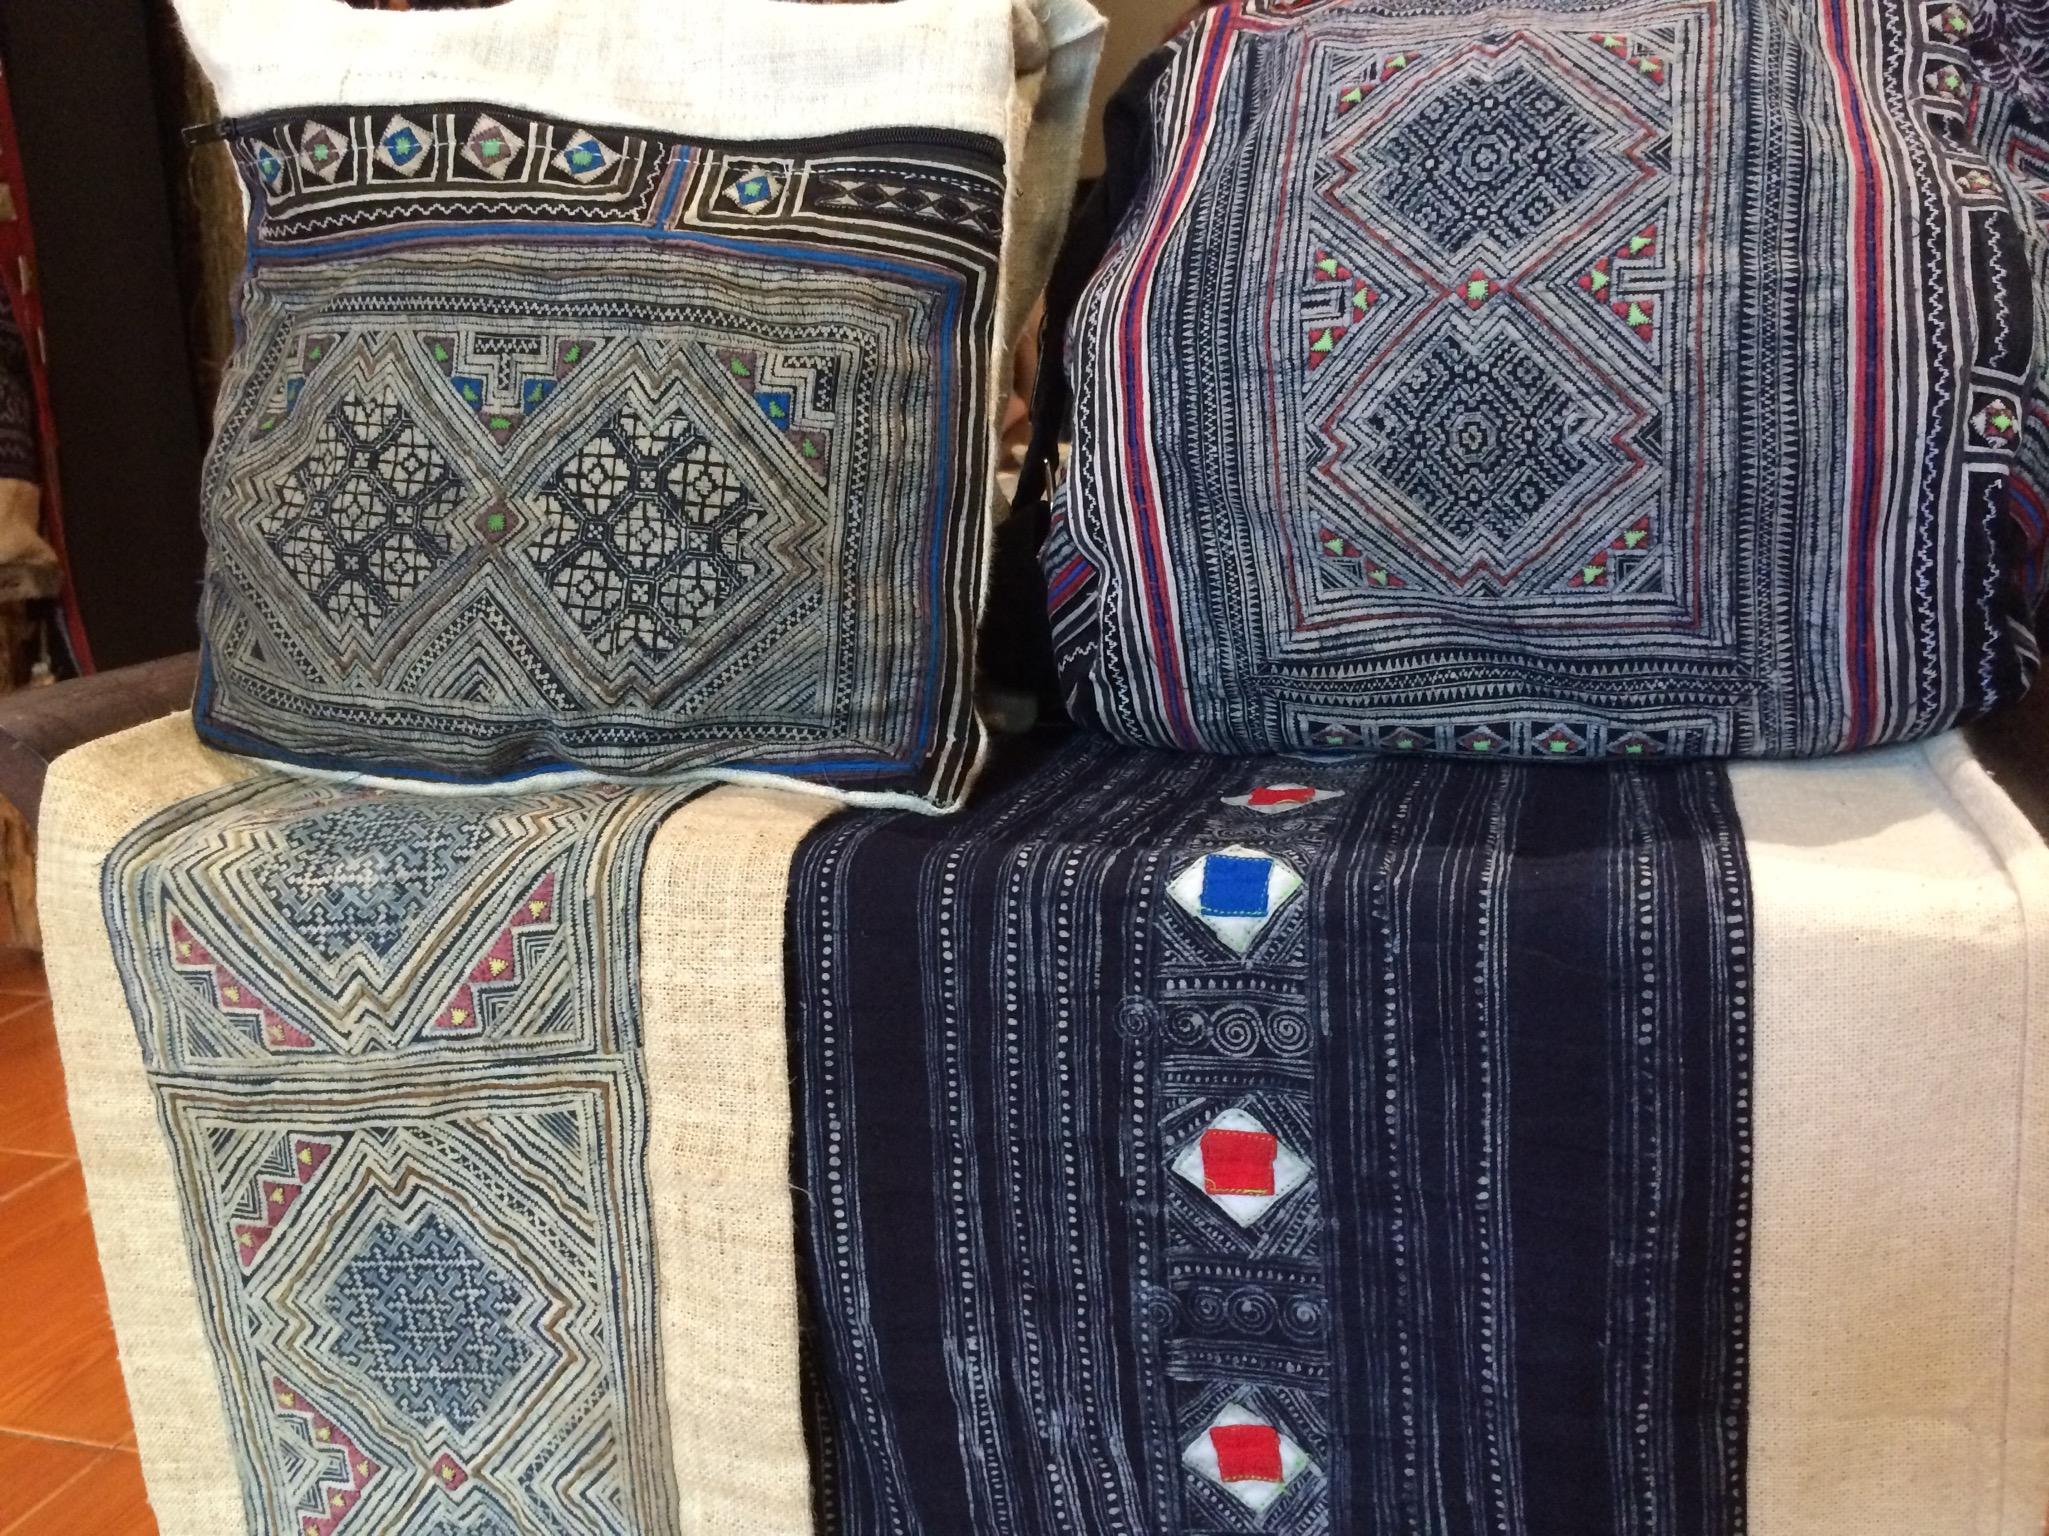 Hmong batik textiles laos